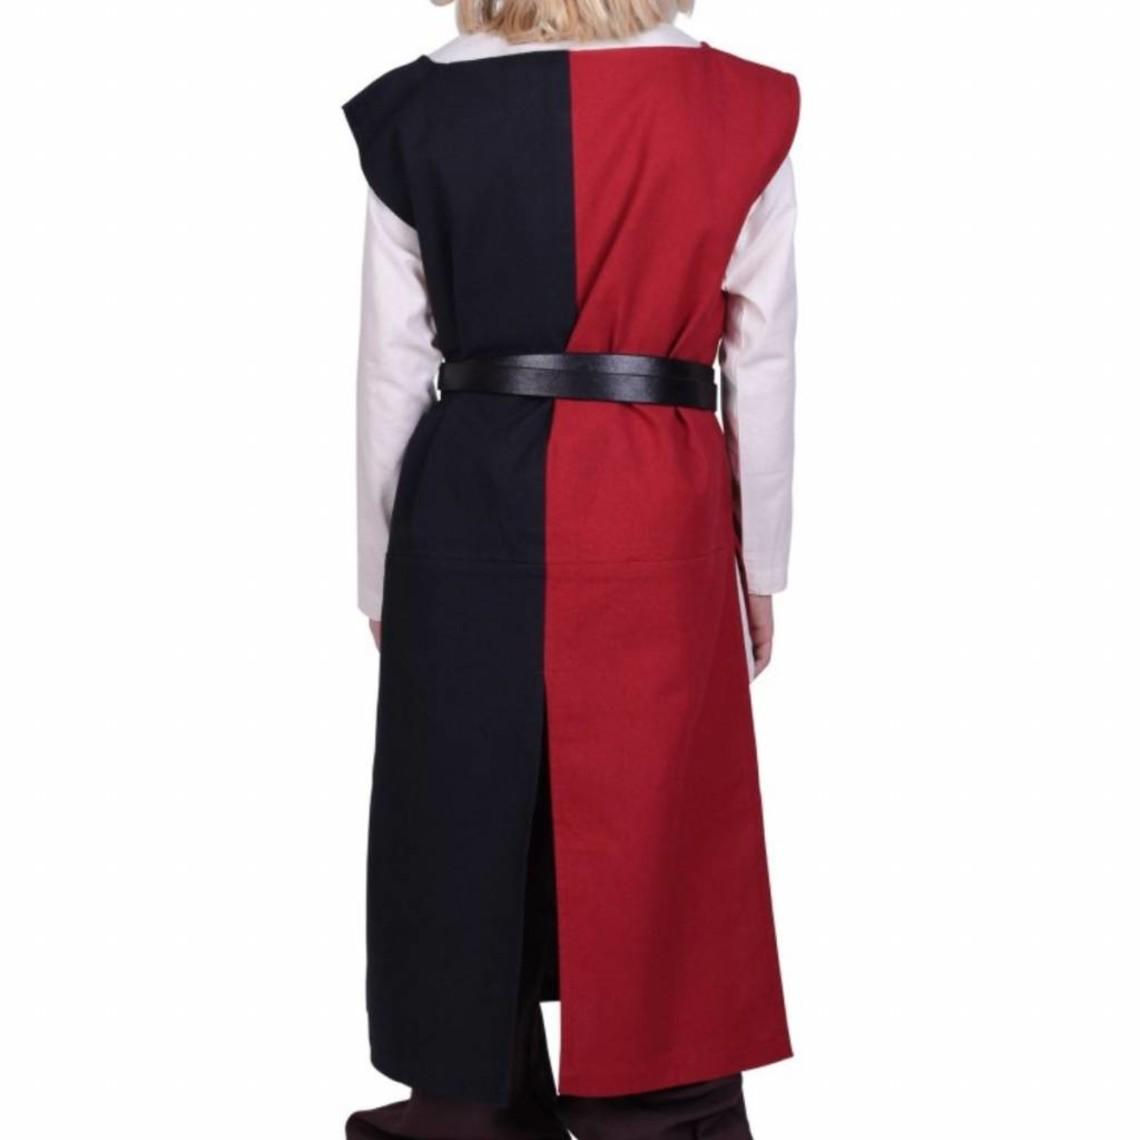 Kinderoverkleed Rodrick, zwart-rood